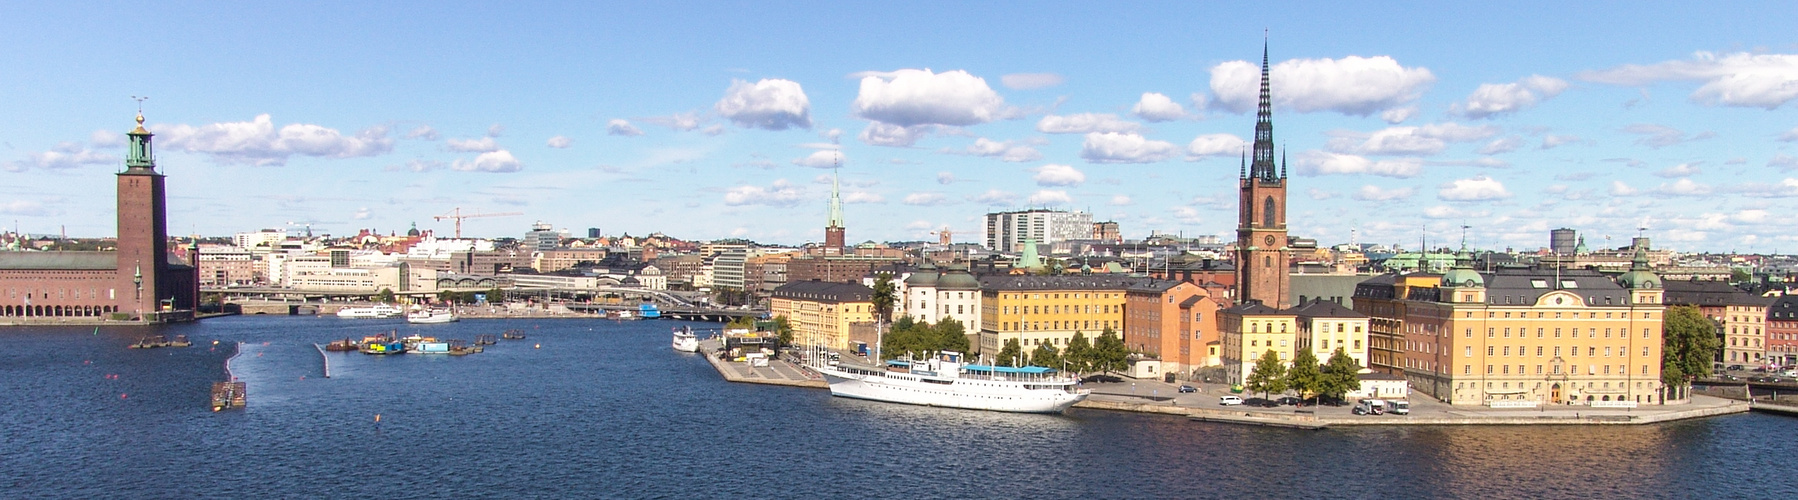 Stockholm-Panorama, 2007